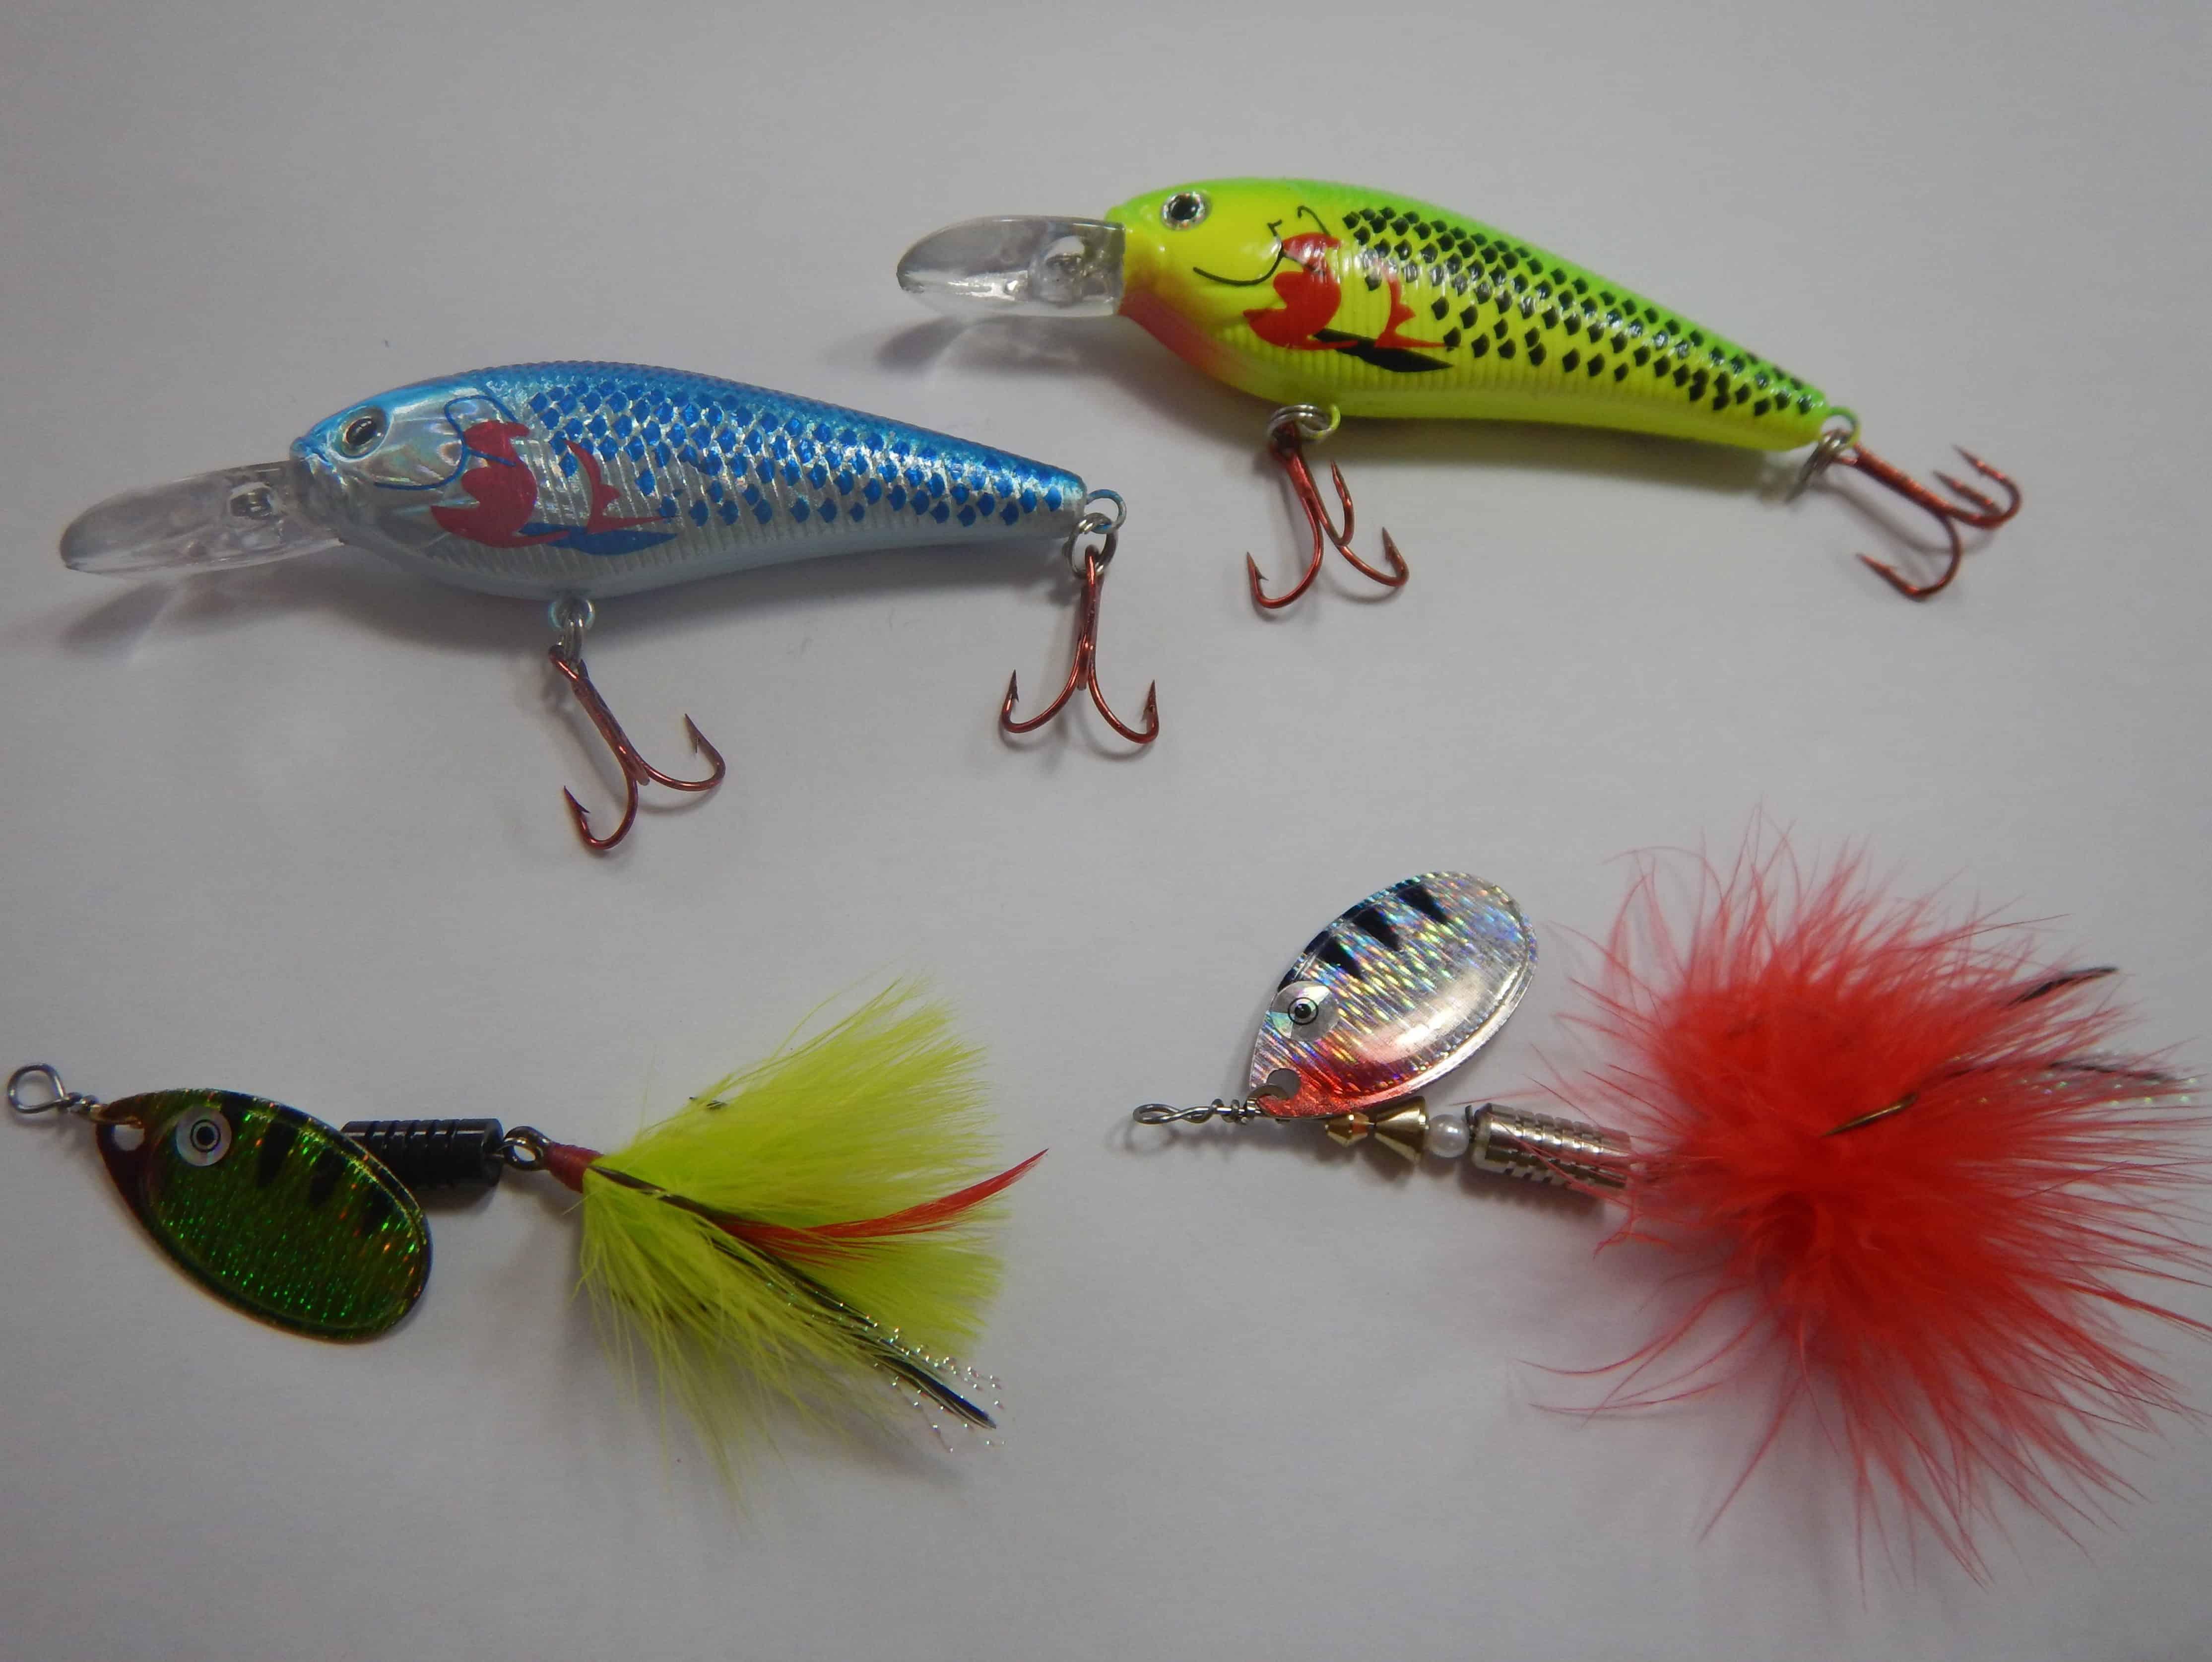 Twist Rotate Spinner Tackle Treble Hook Crankbaits Spoon Metal Fishing Bait